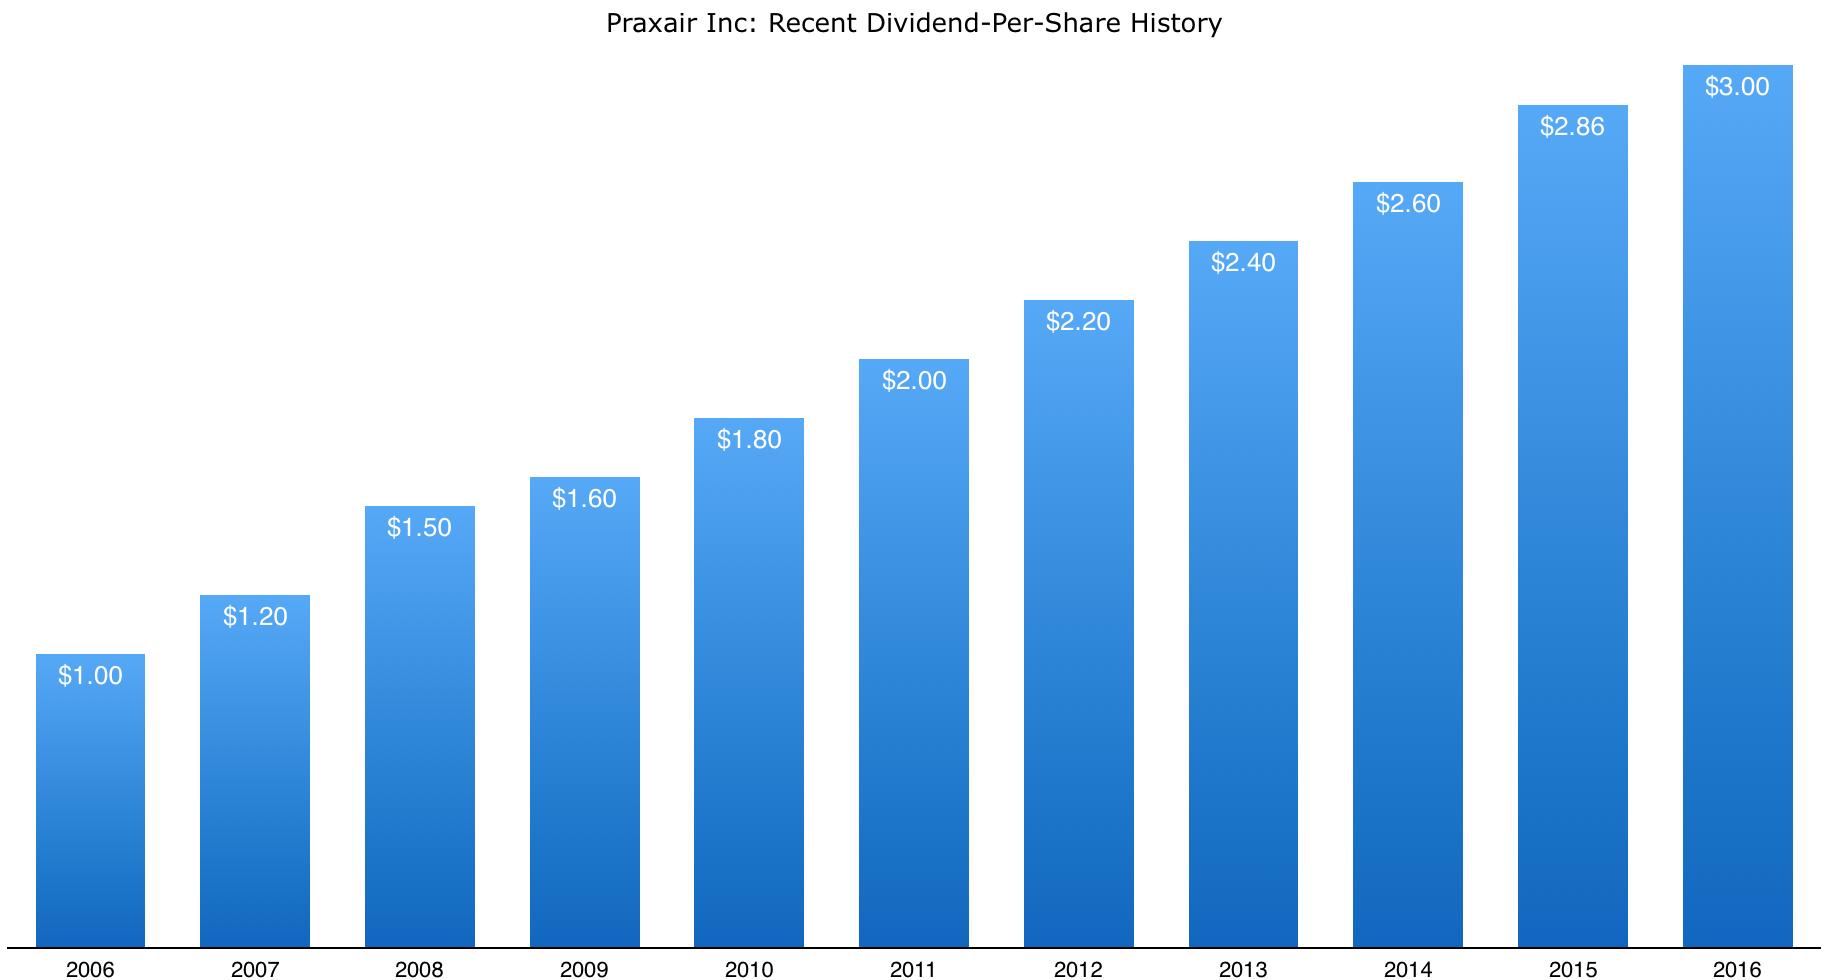 praxair_dividend_history